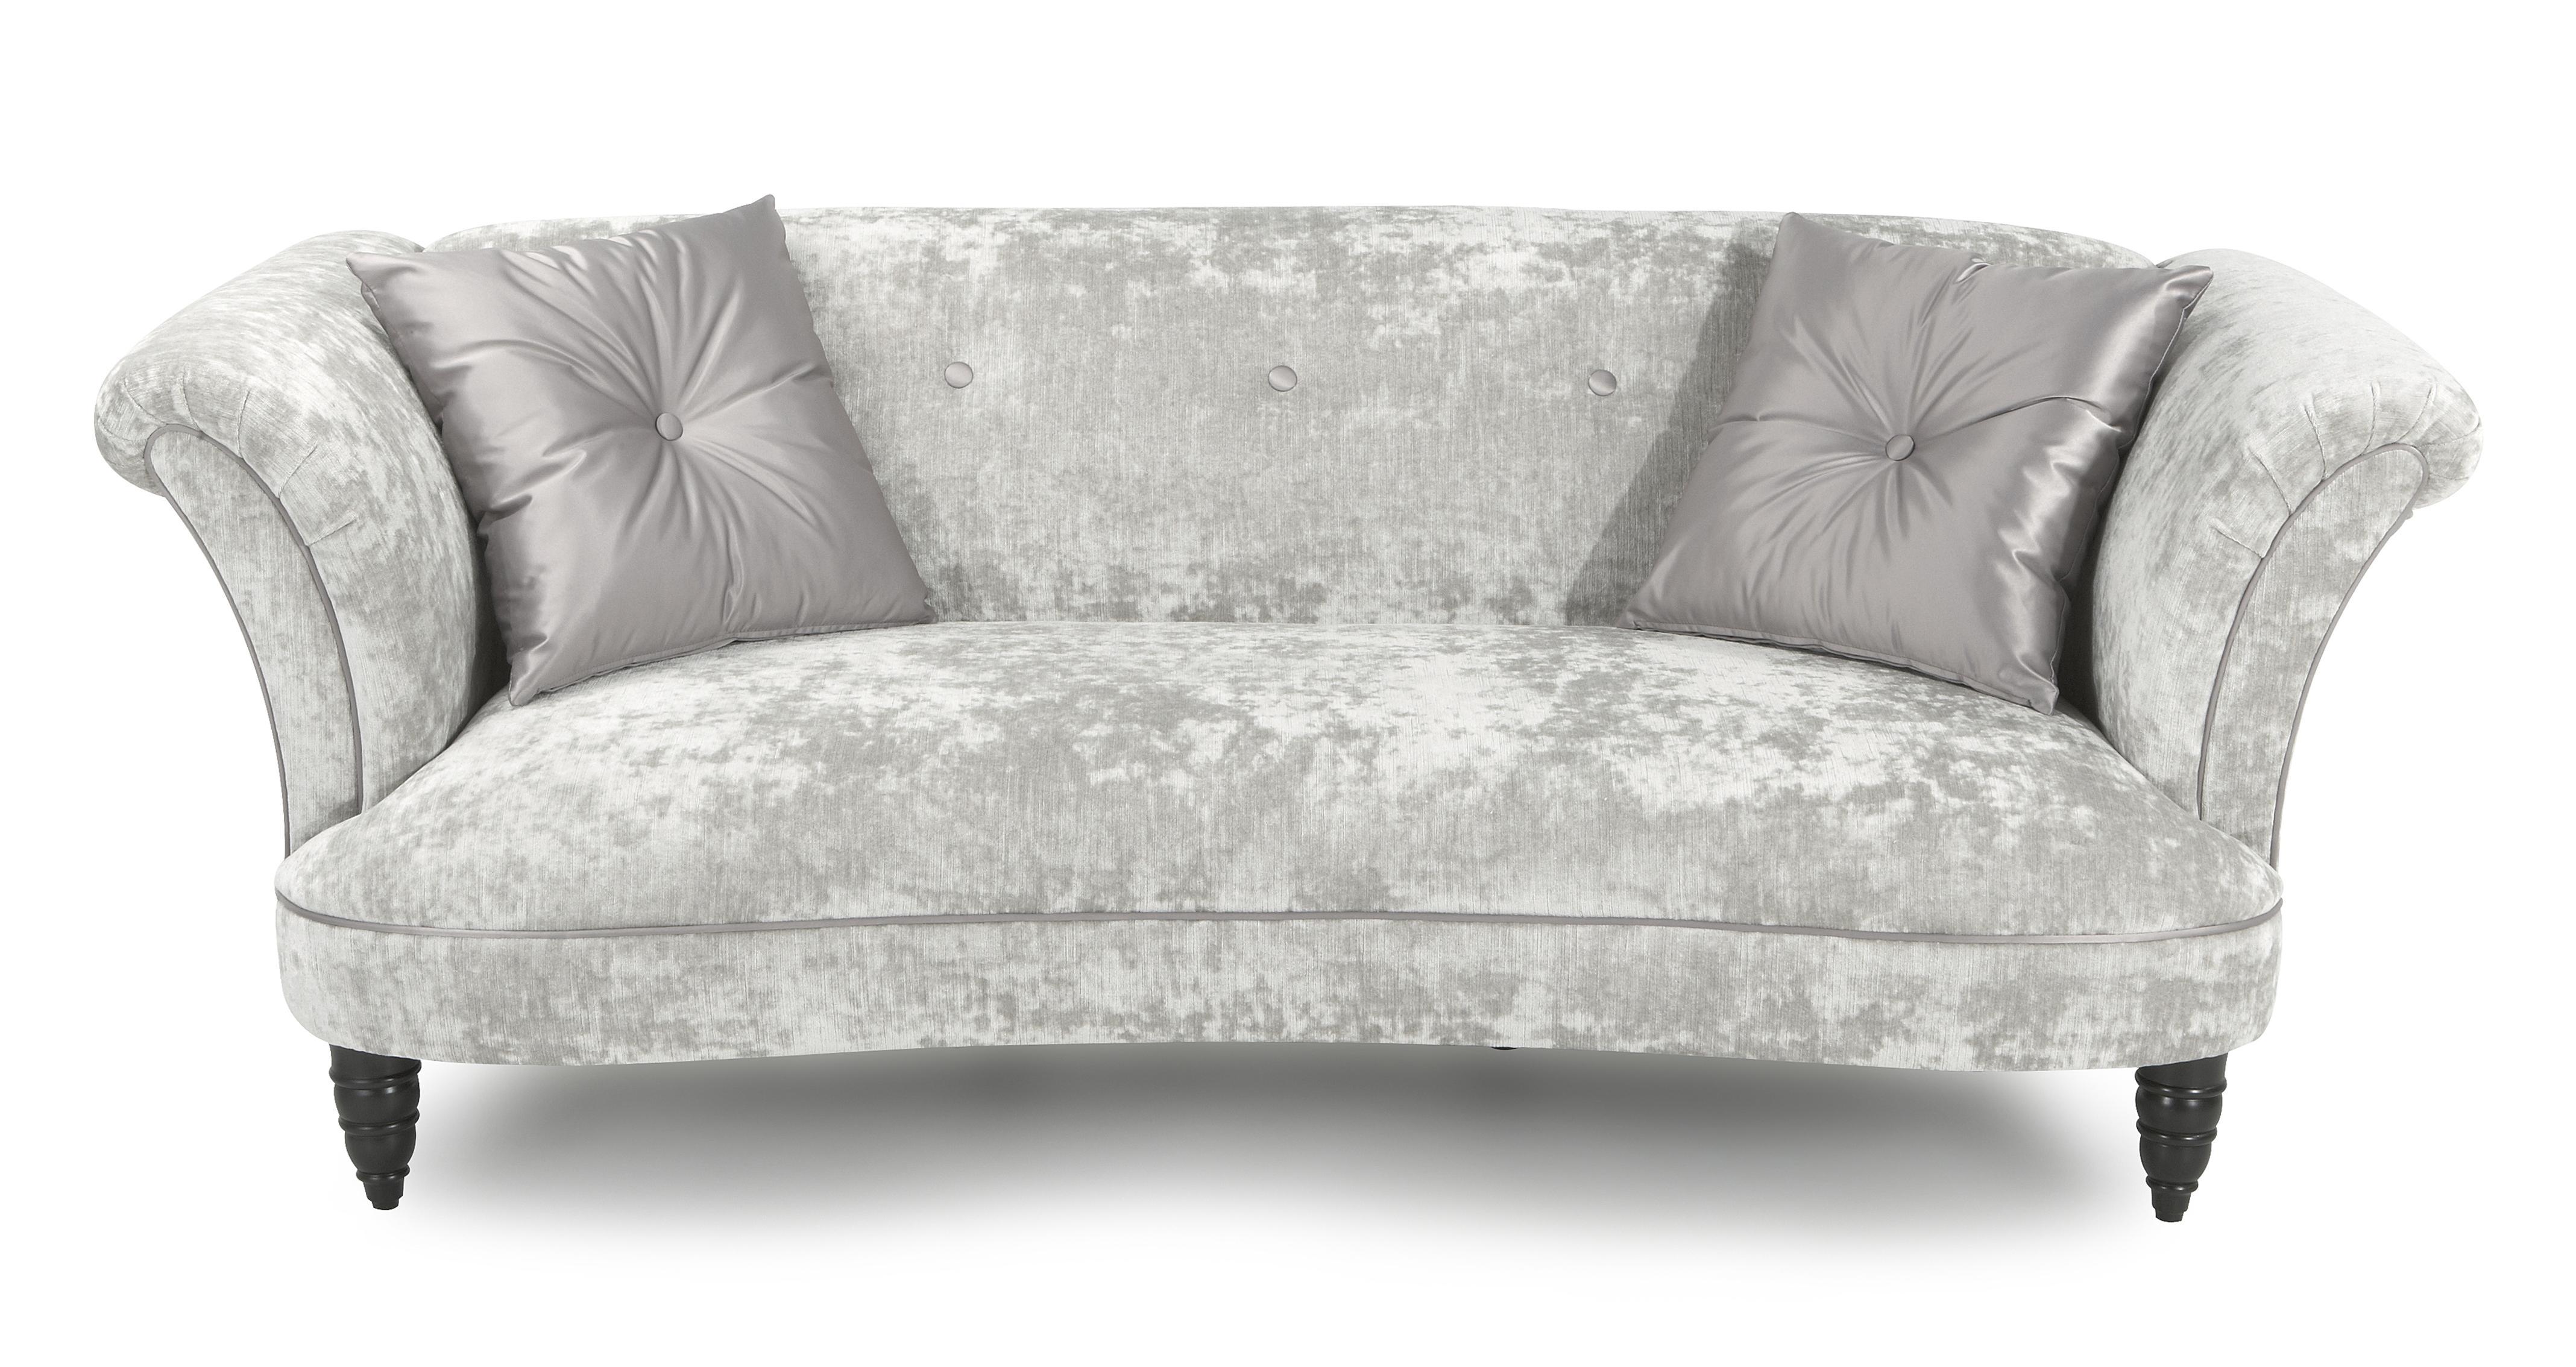 dfs sophia sofa reviews designer throws for sofas concerto 3 seater